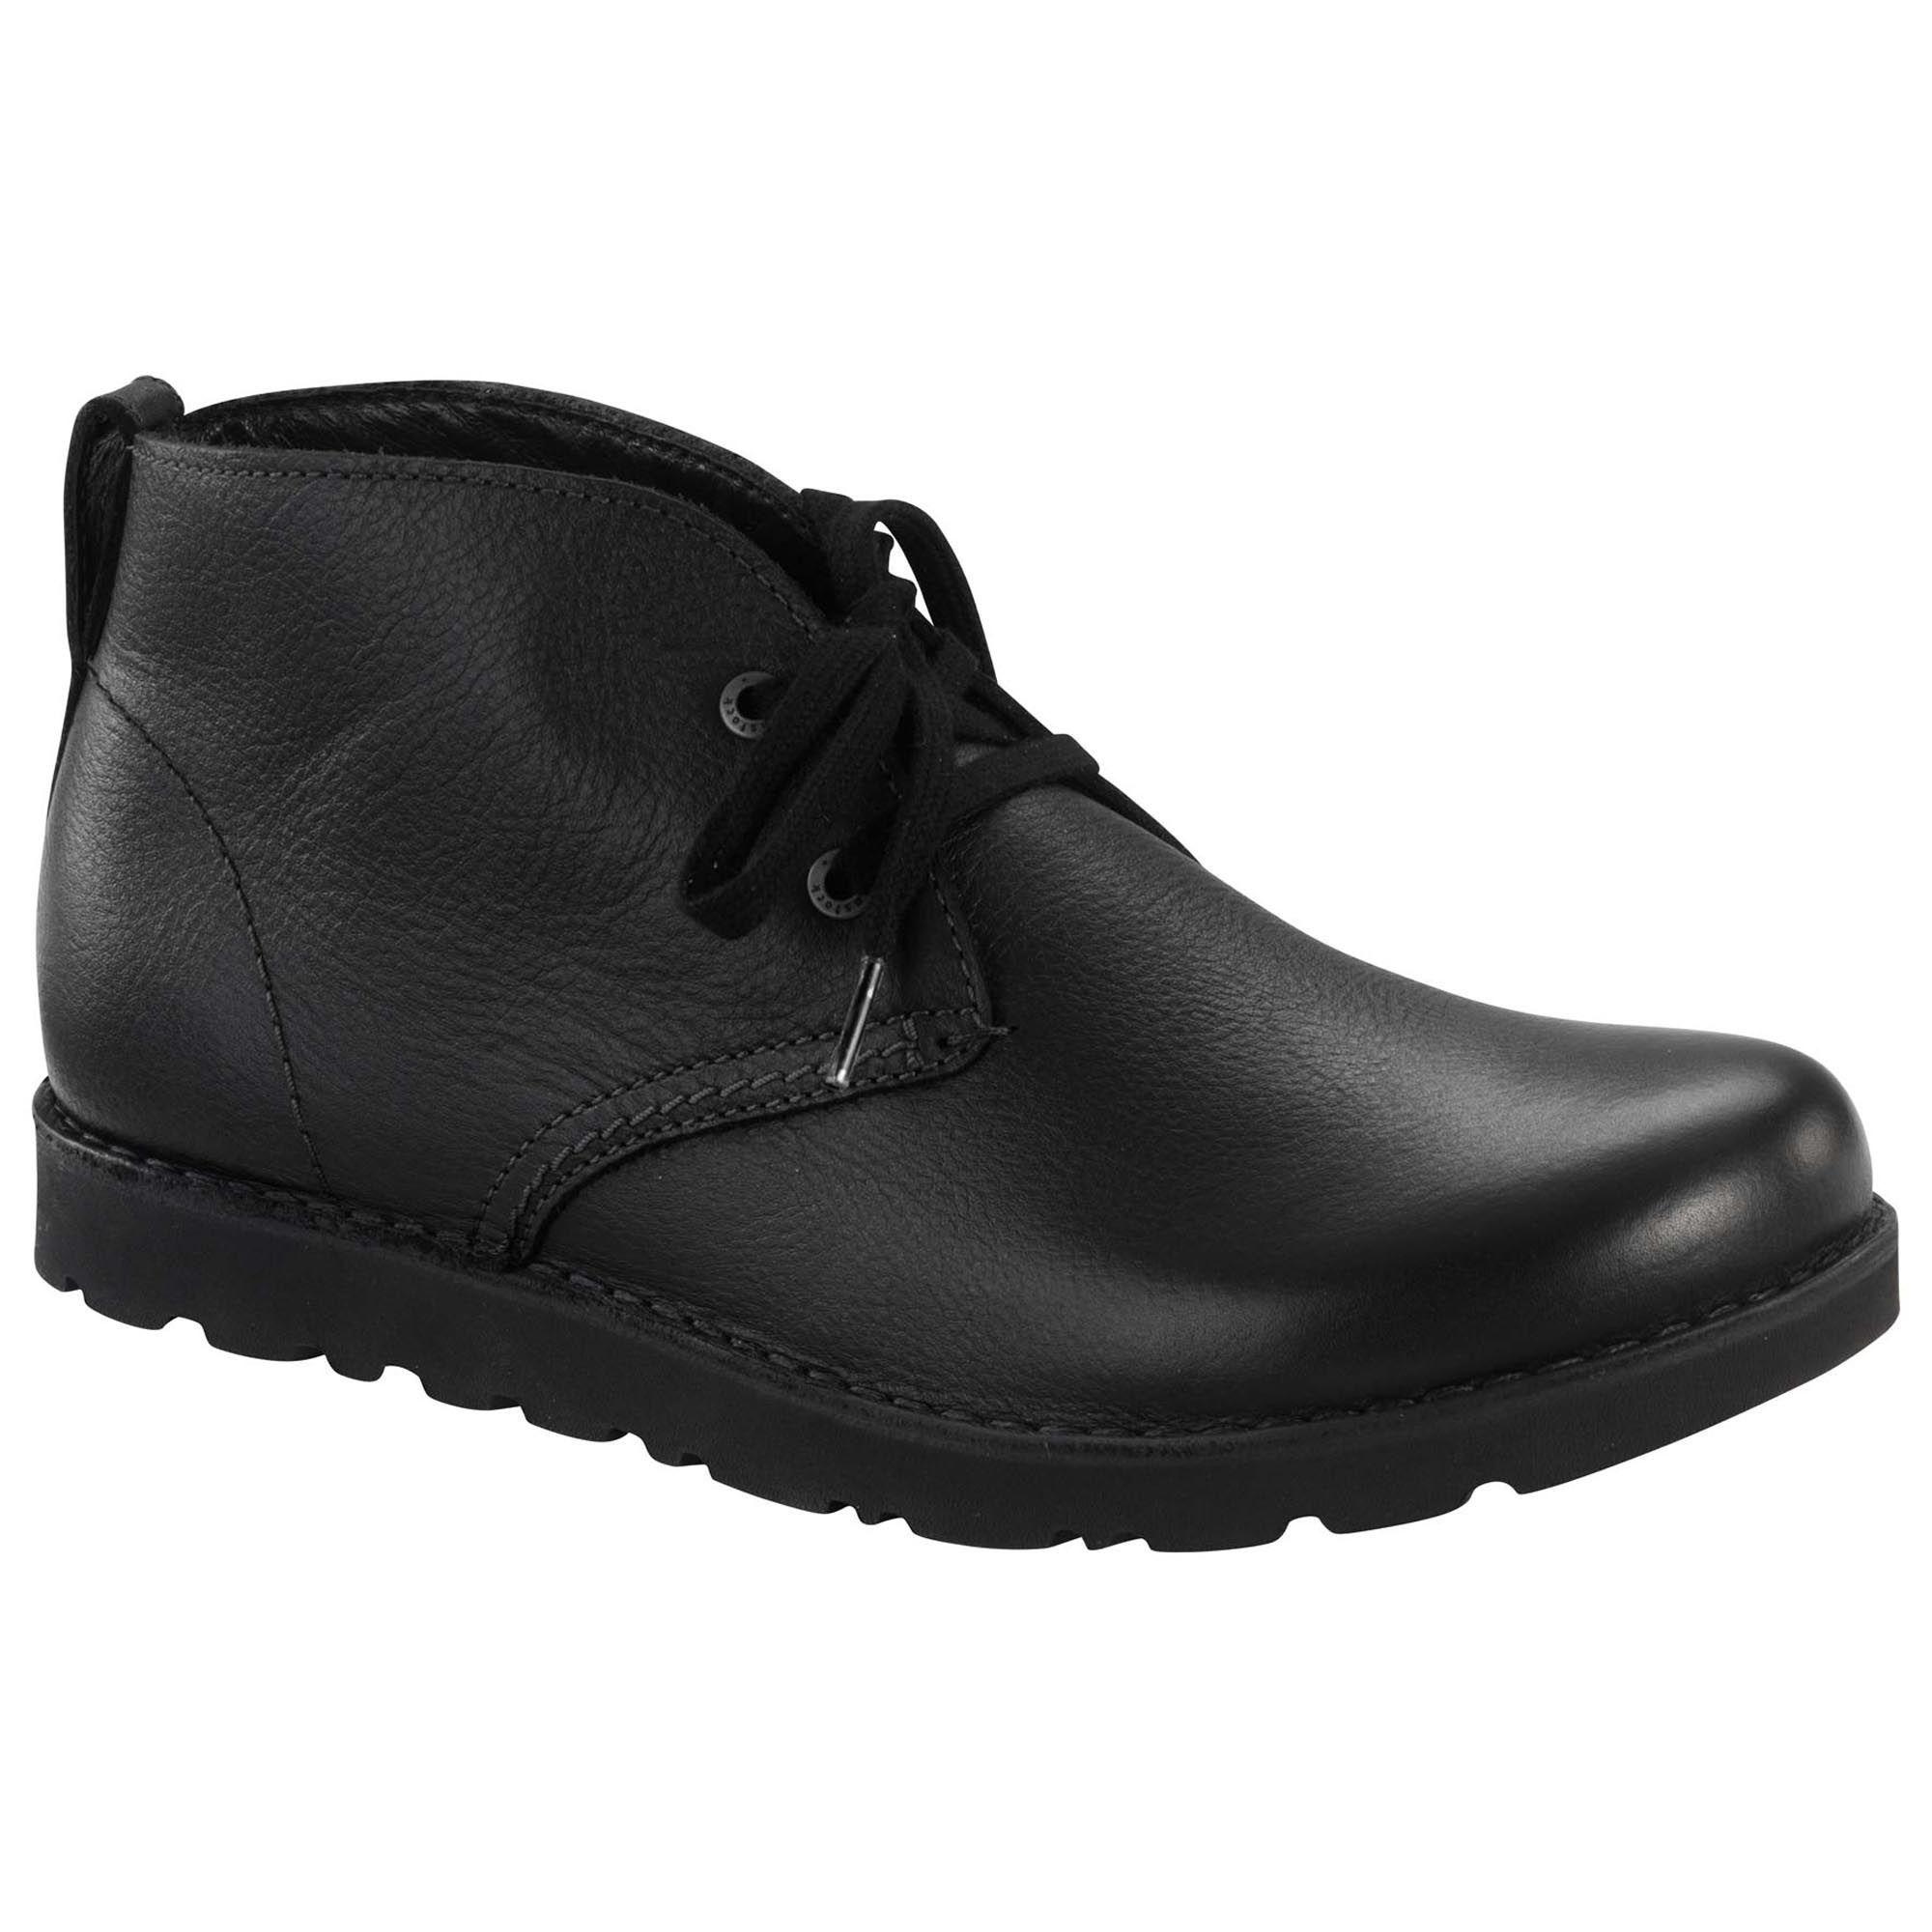 Harris Black Leather